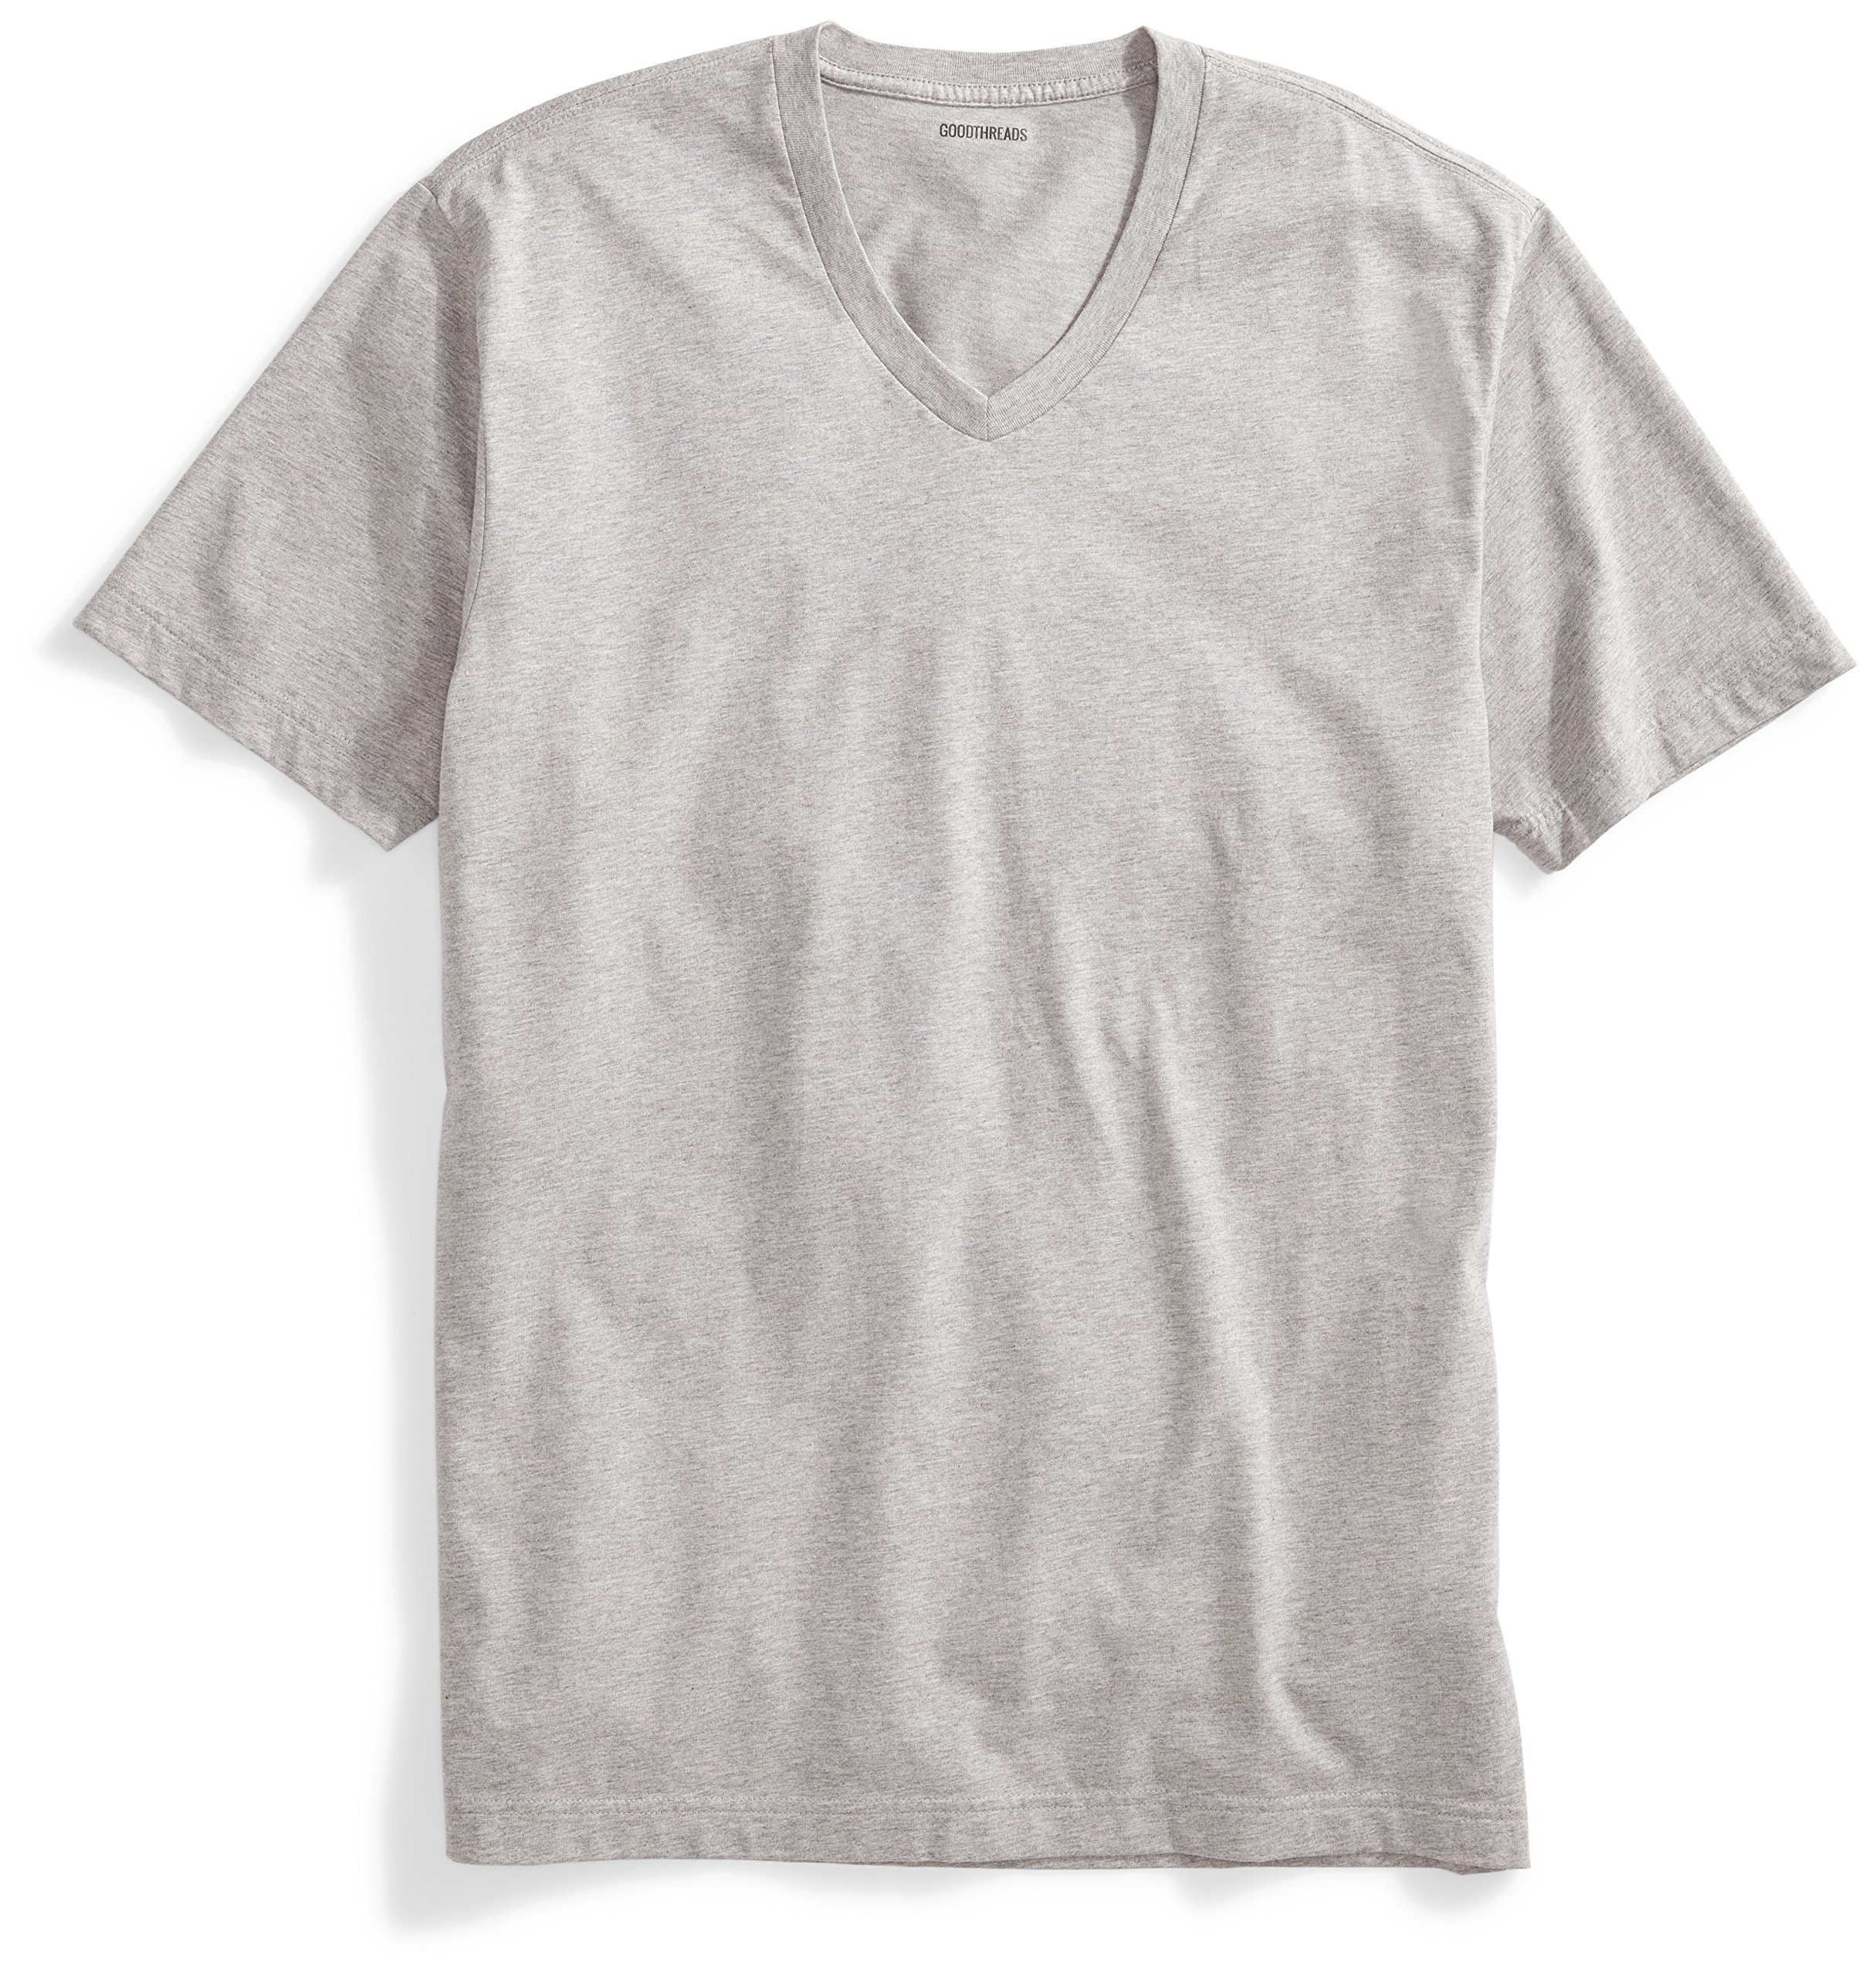 Goodthreads Men's Short-Sleeve V-Neck Cotton T-Shirt, Heather Grey, Medium